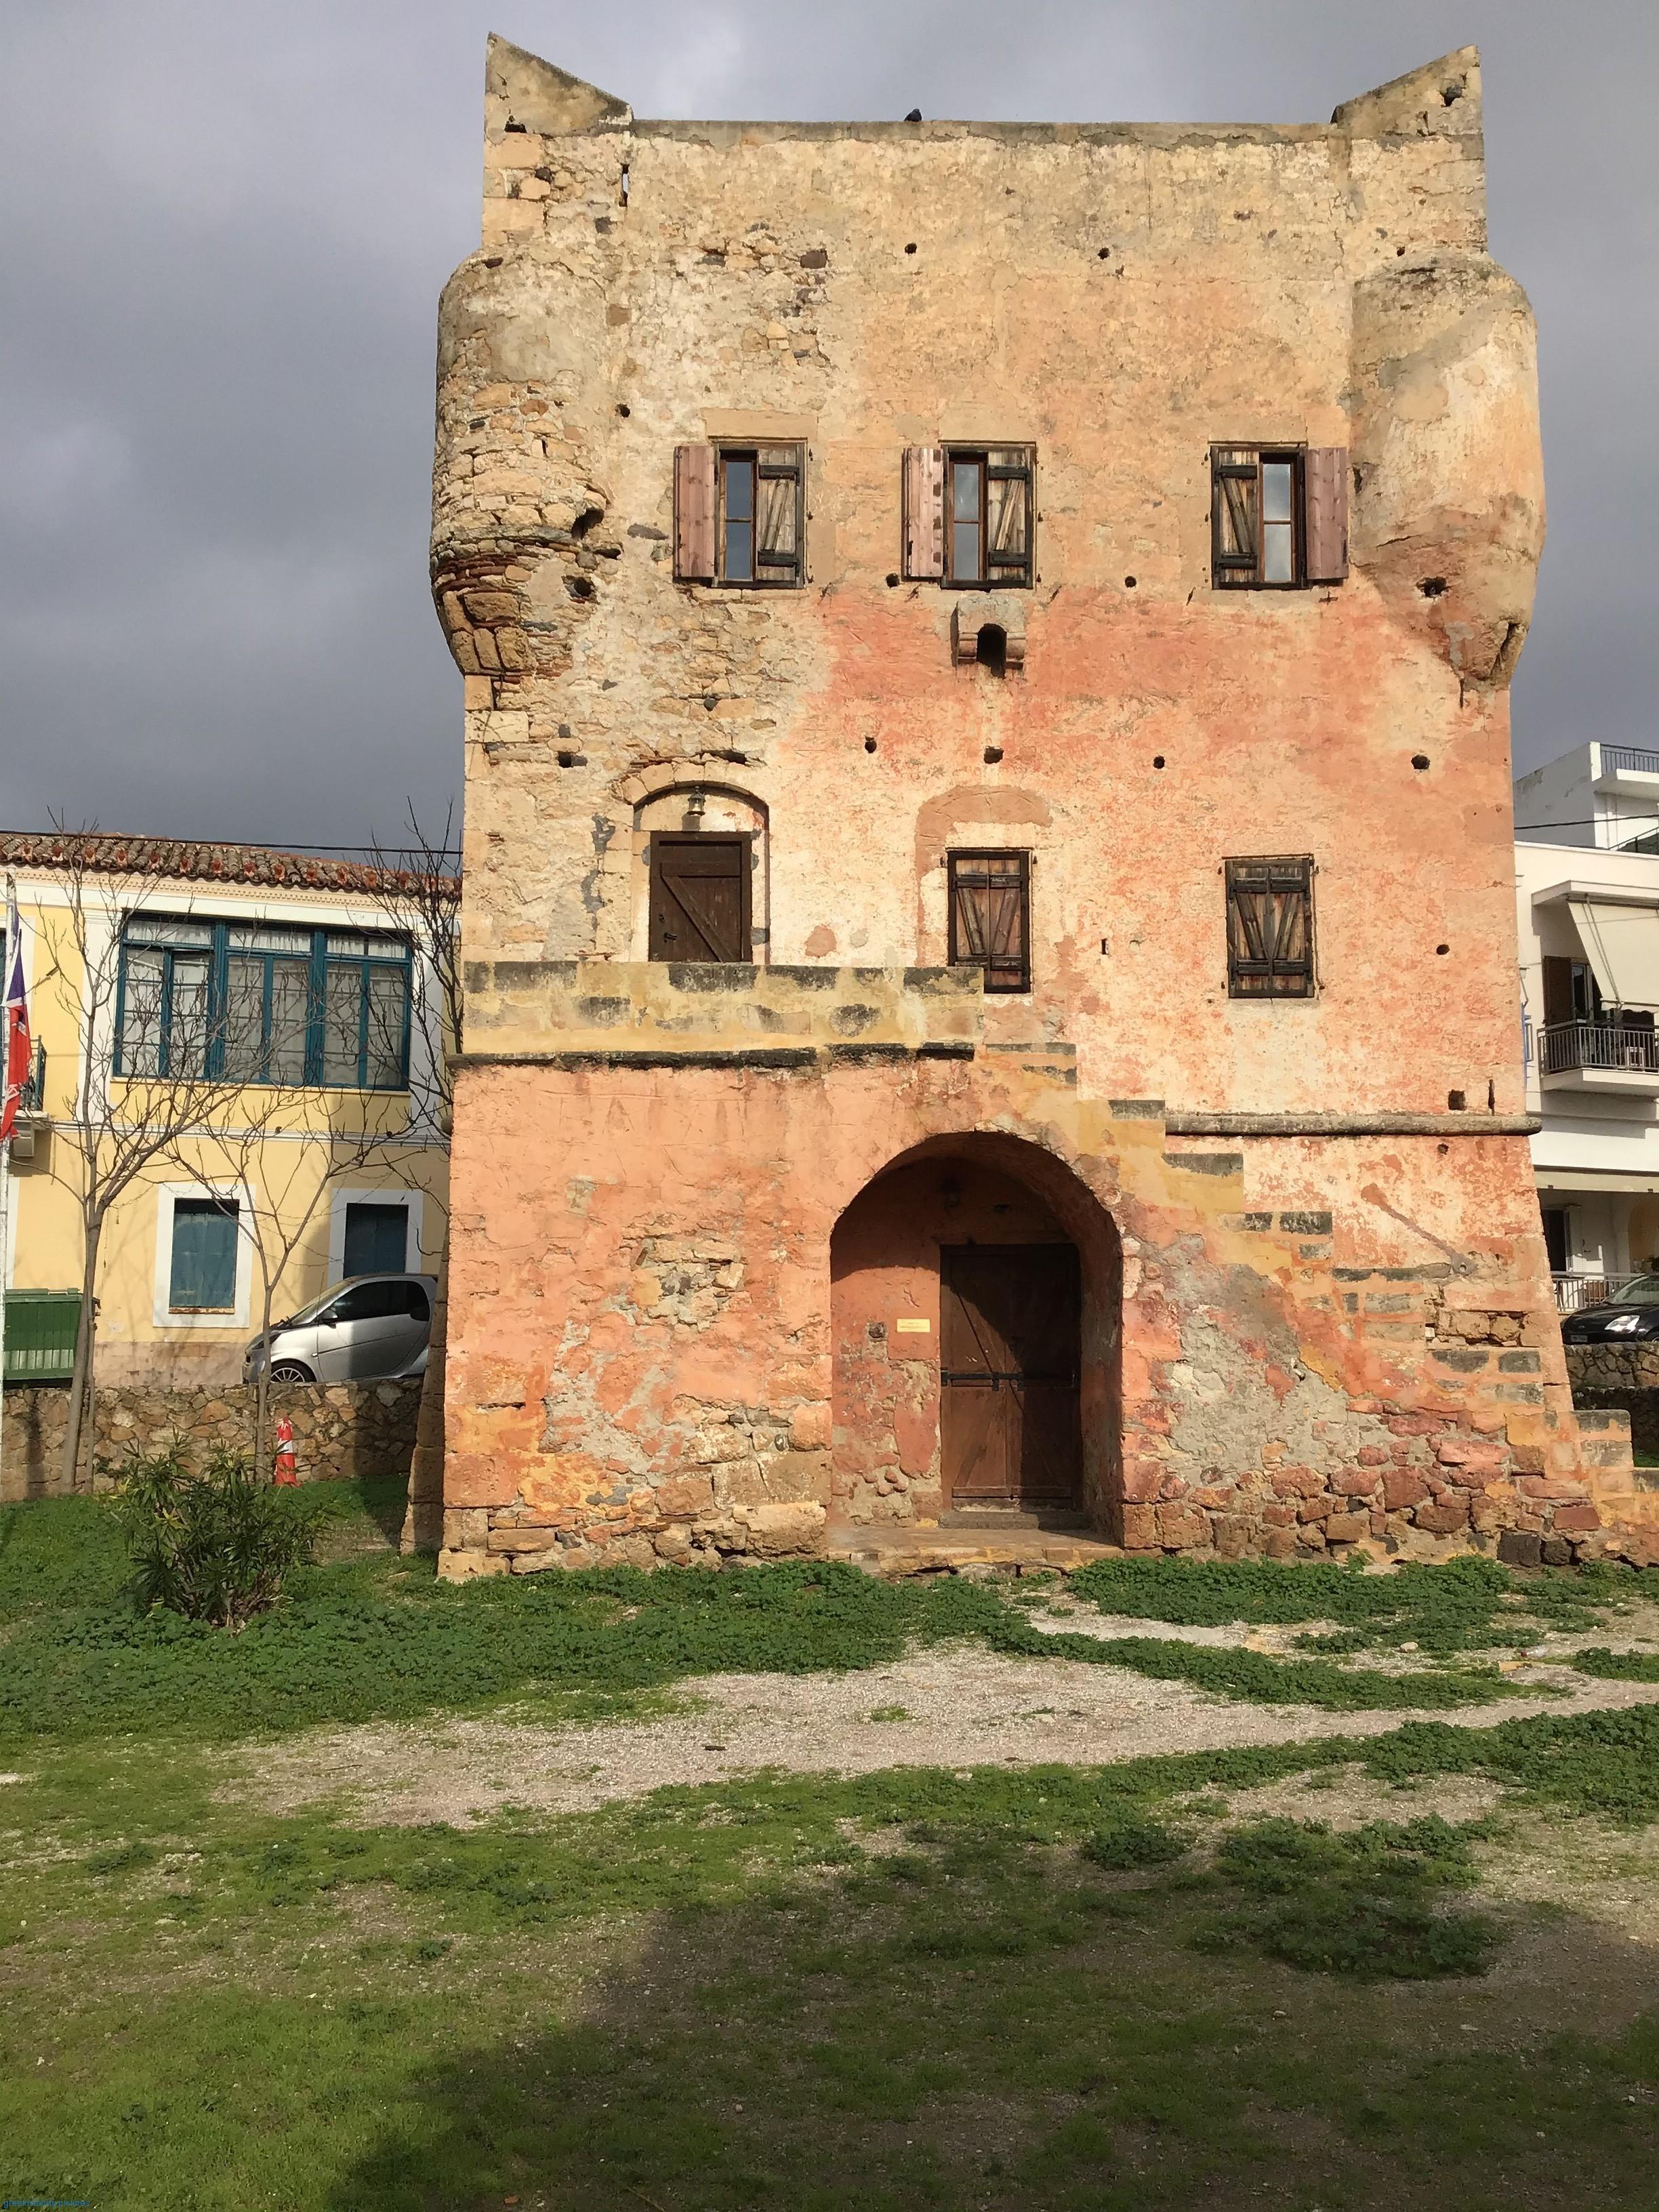 The Venetian era Markellos tower